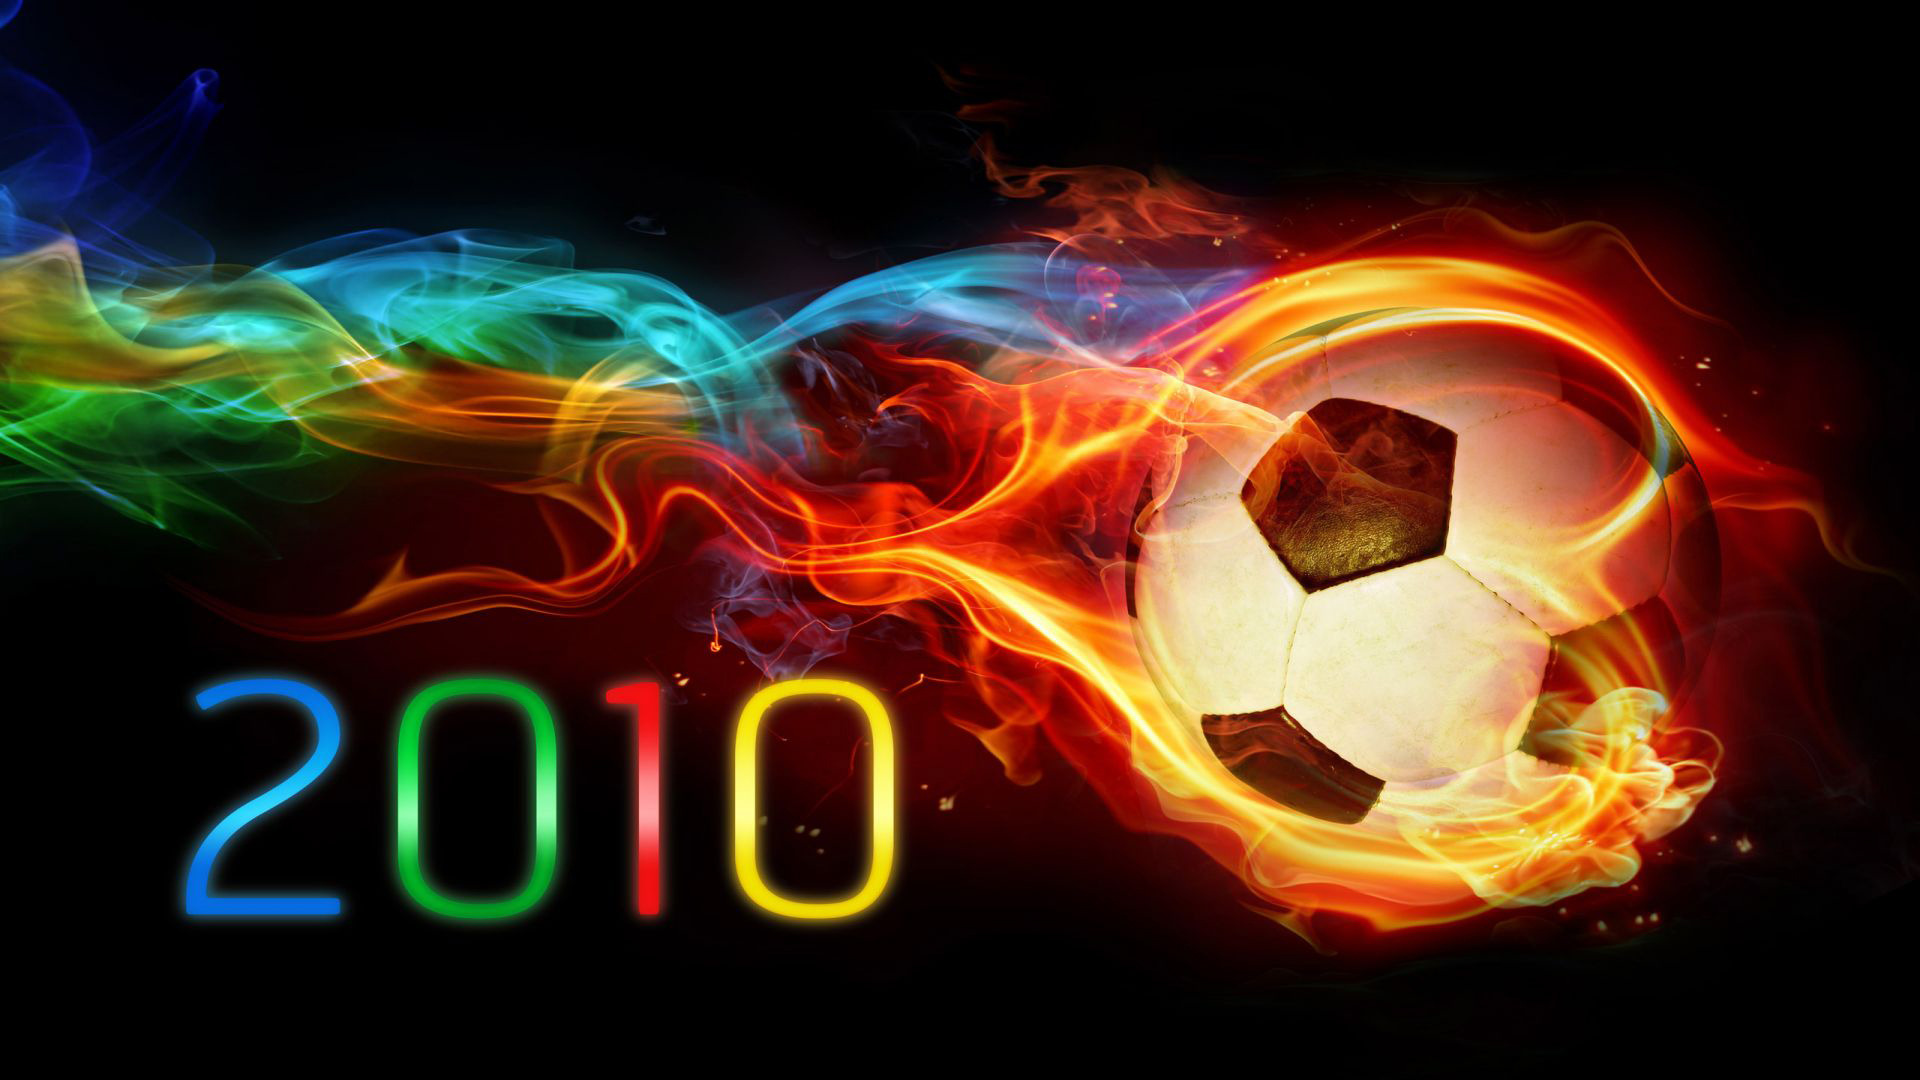 Cool Green Soccer Ball Wallpapers: Flaming Soccer Ball Wallpaper